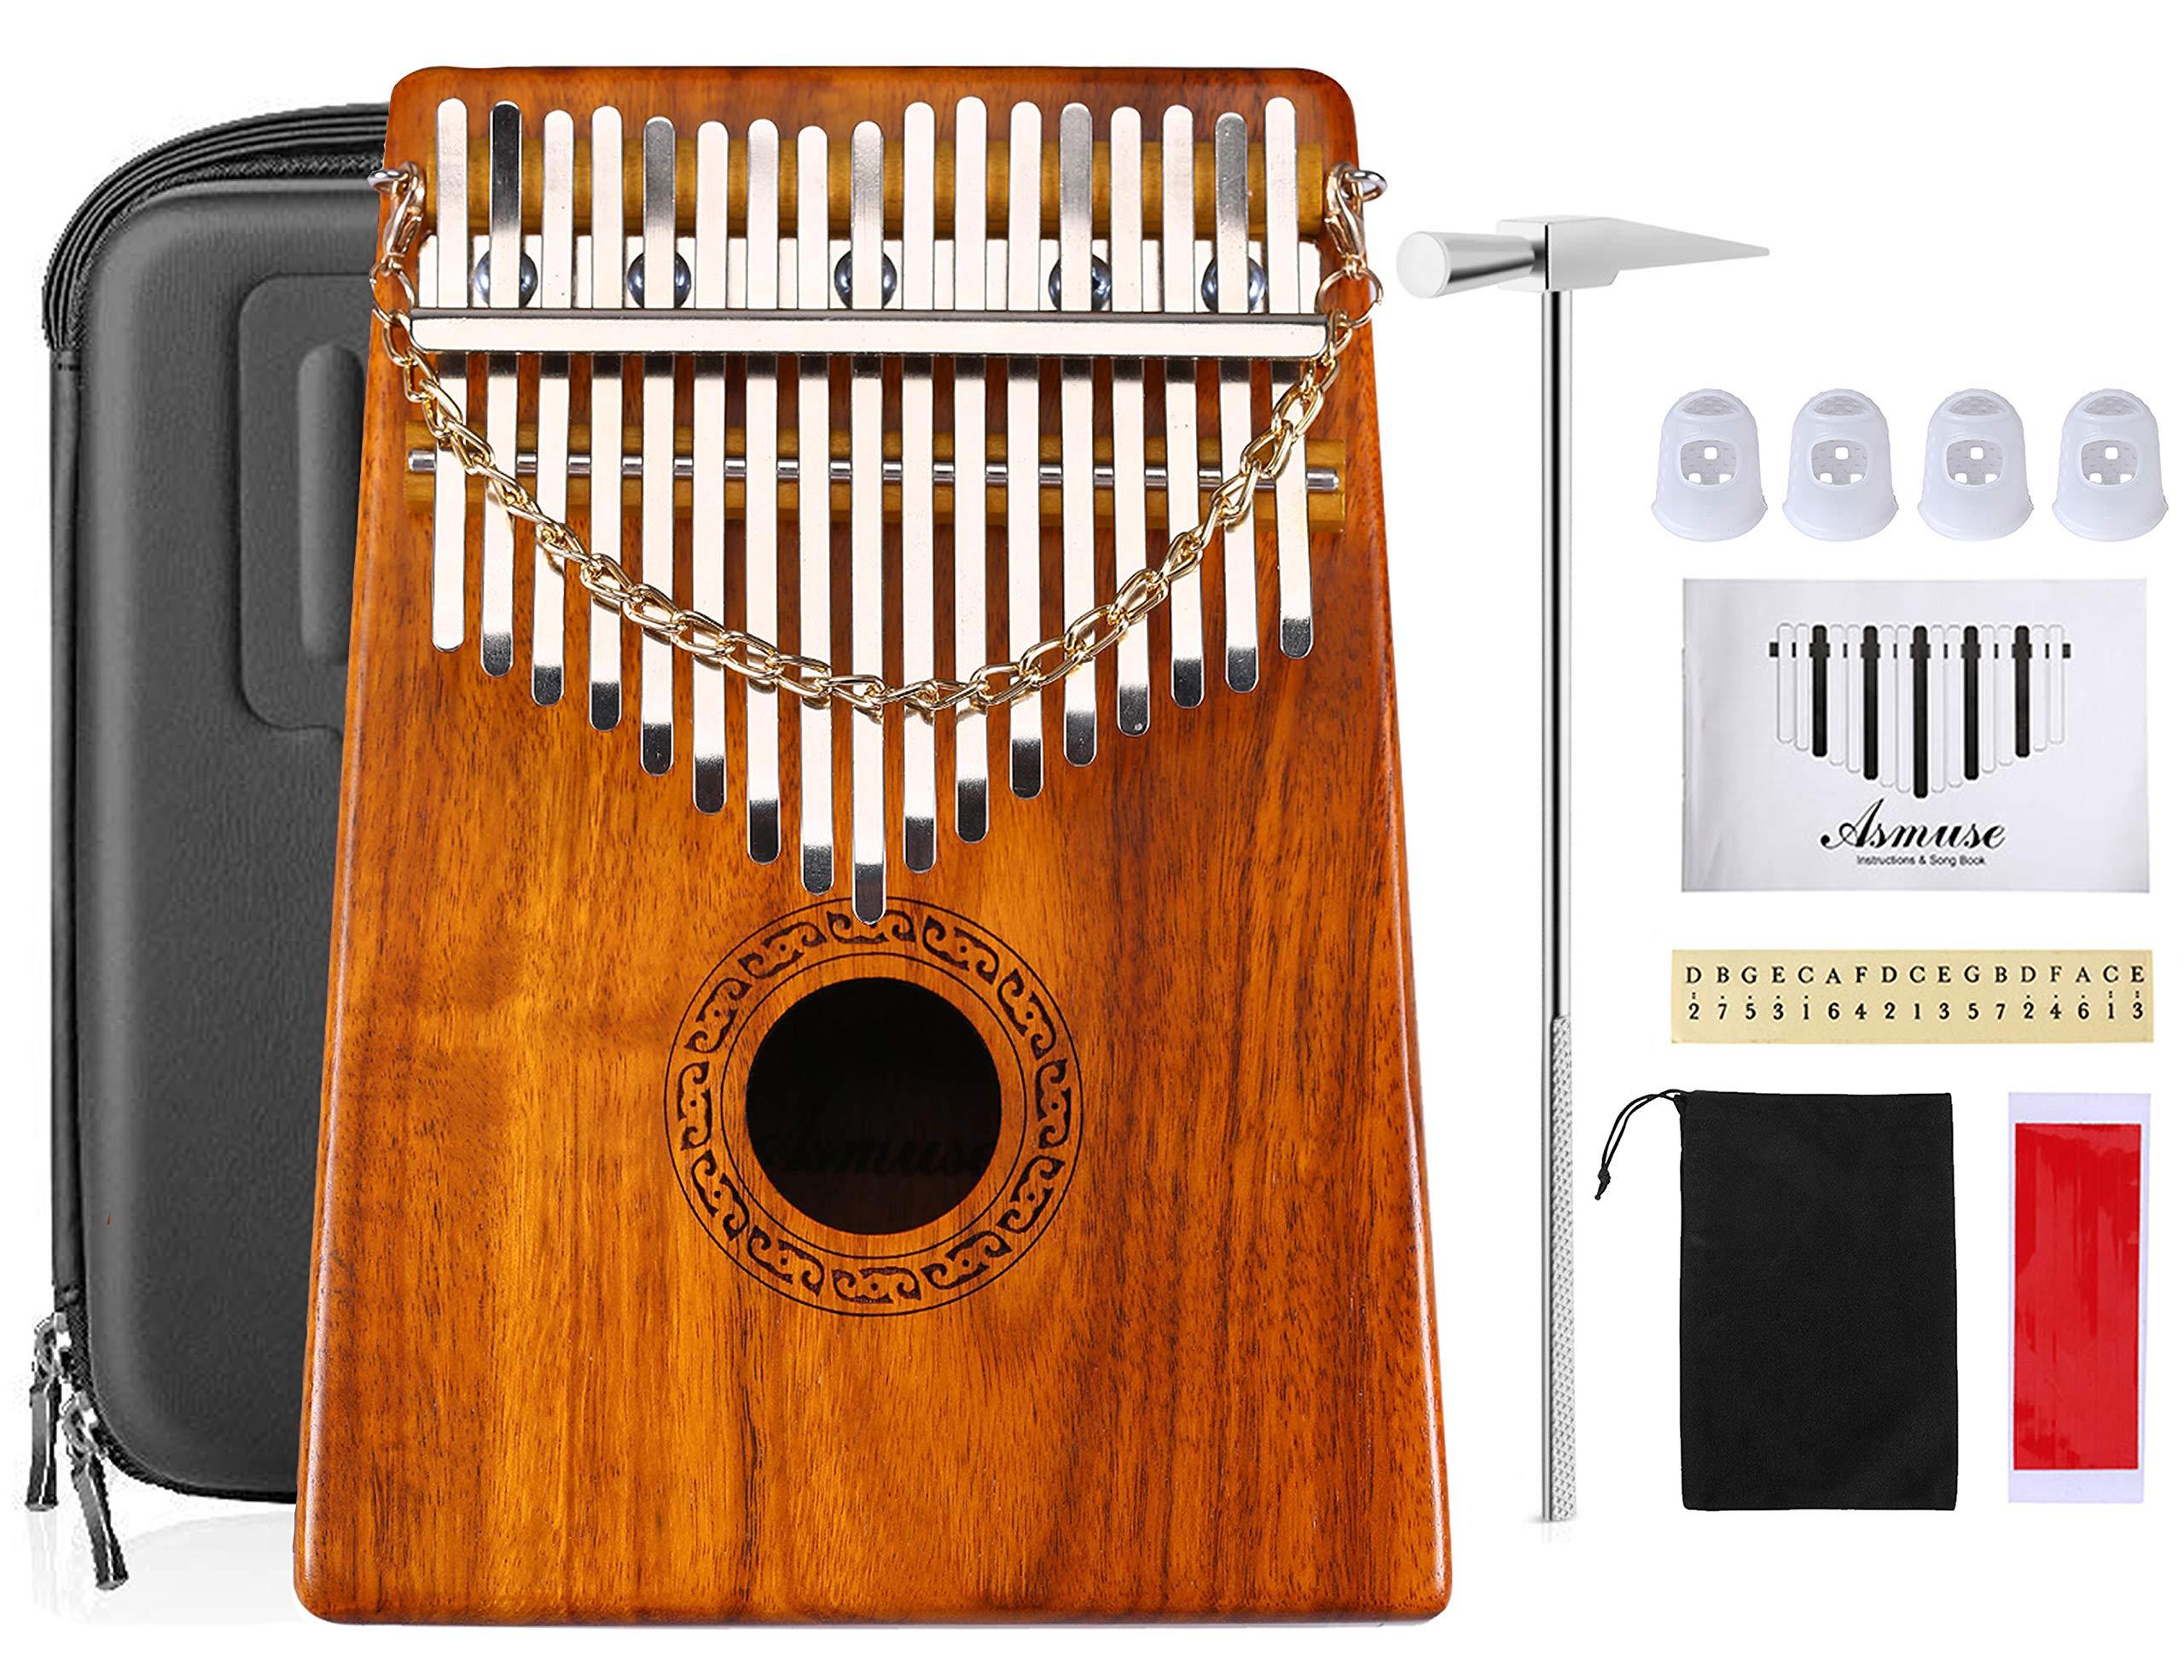 Asmuse Kalimba 17 Keys Acacia KOA Thumb Piano Mbira Sanza Thumb Instrument with 15 Songbook,Tuning Hammer,4 Pcs Finger Thumb Picks and EVA High Protection Box (EVA Case Included) by Asmuse